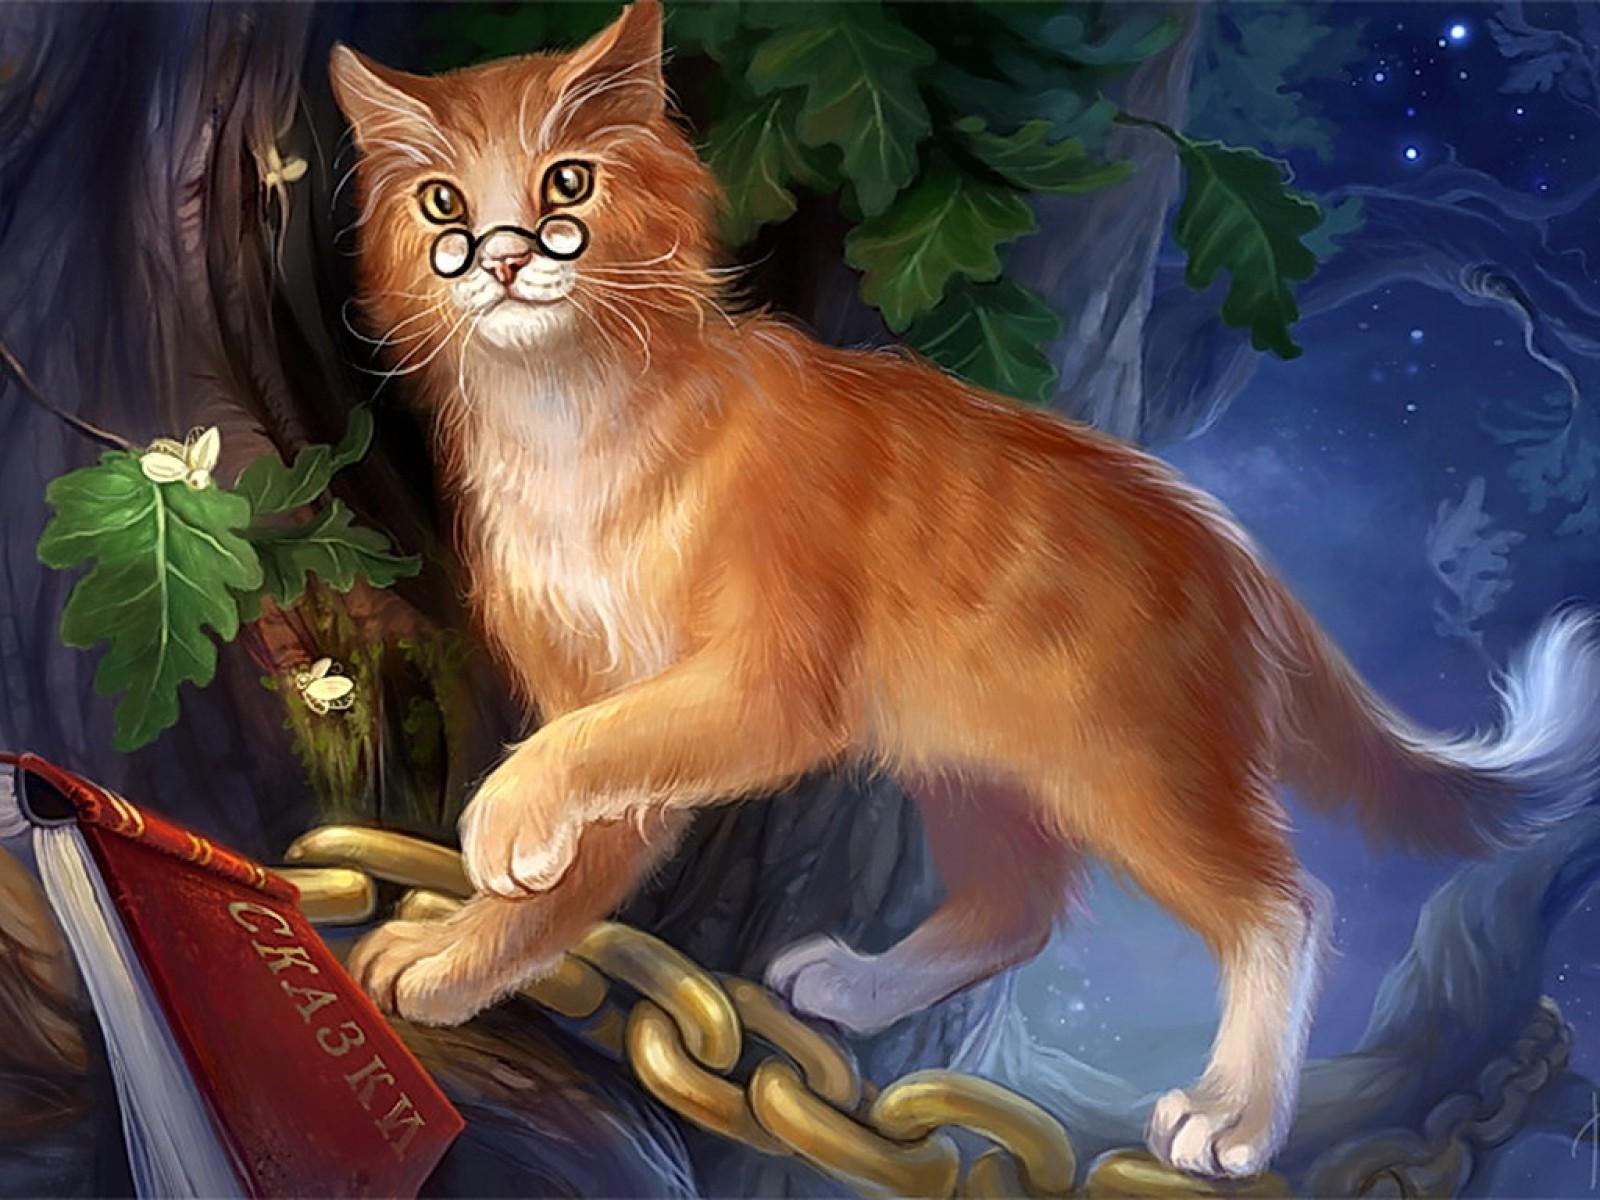 Género Fantástico - Animalia  - Gato Fondo de Pantalla